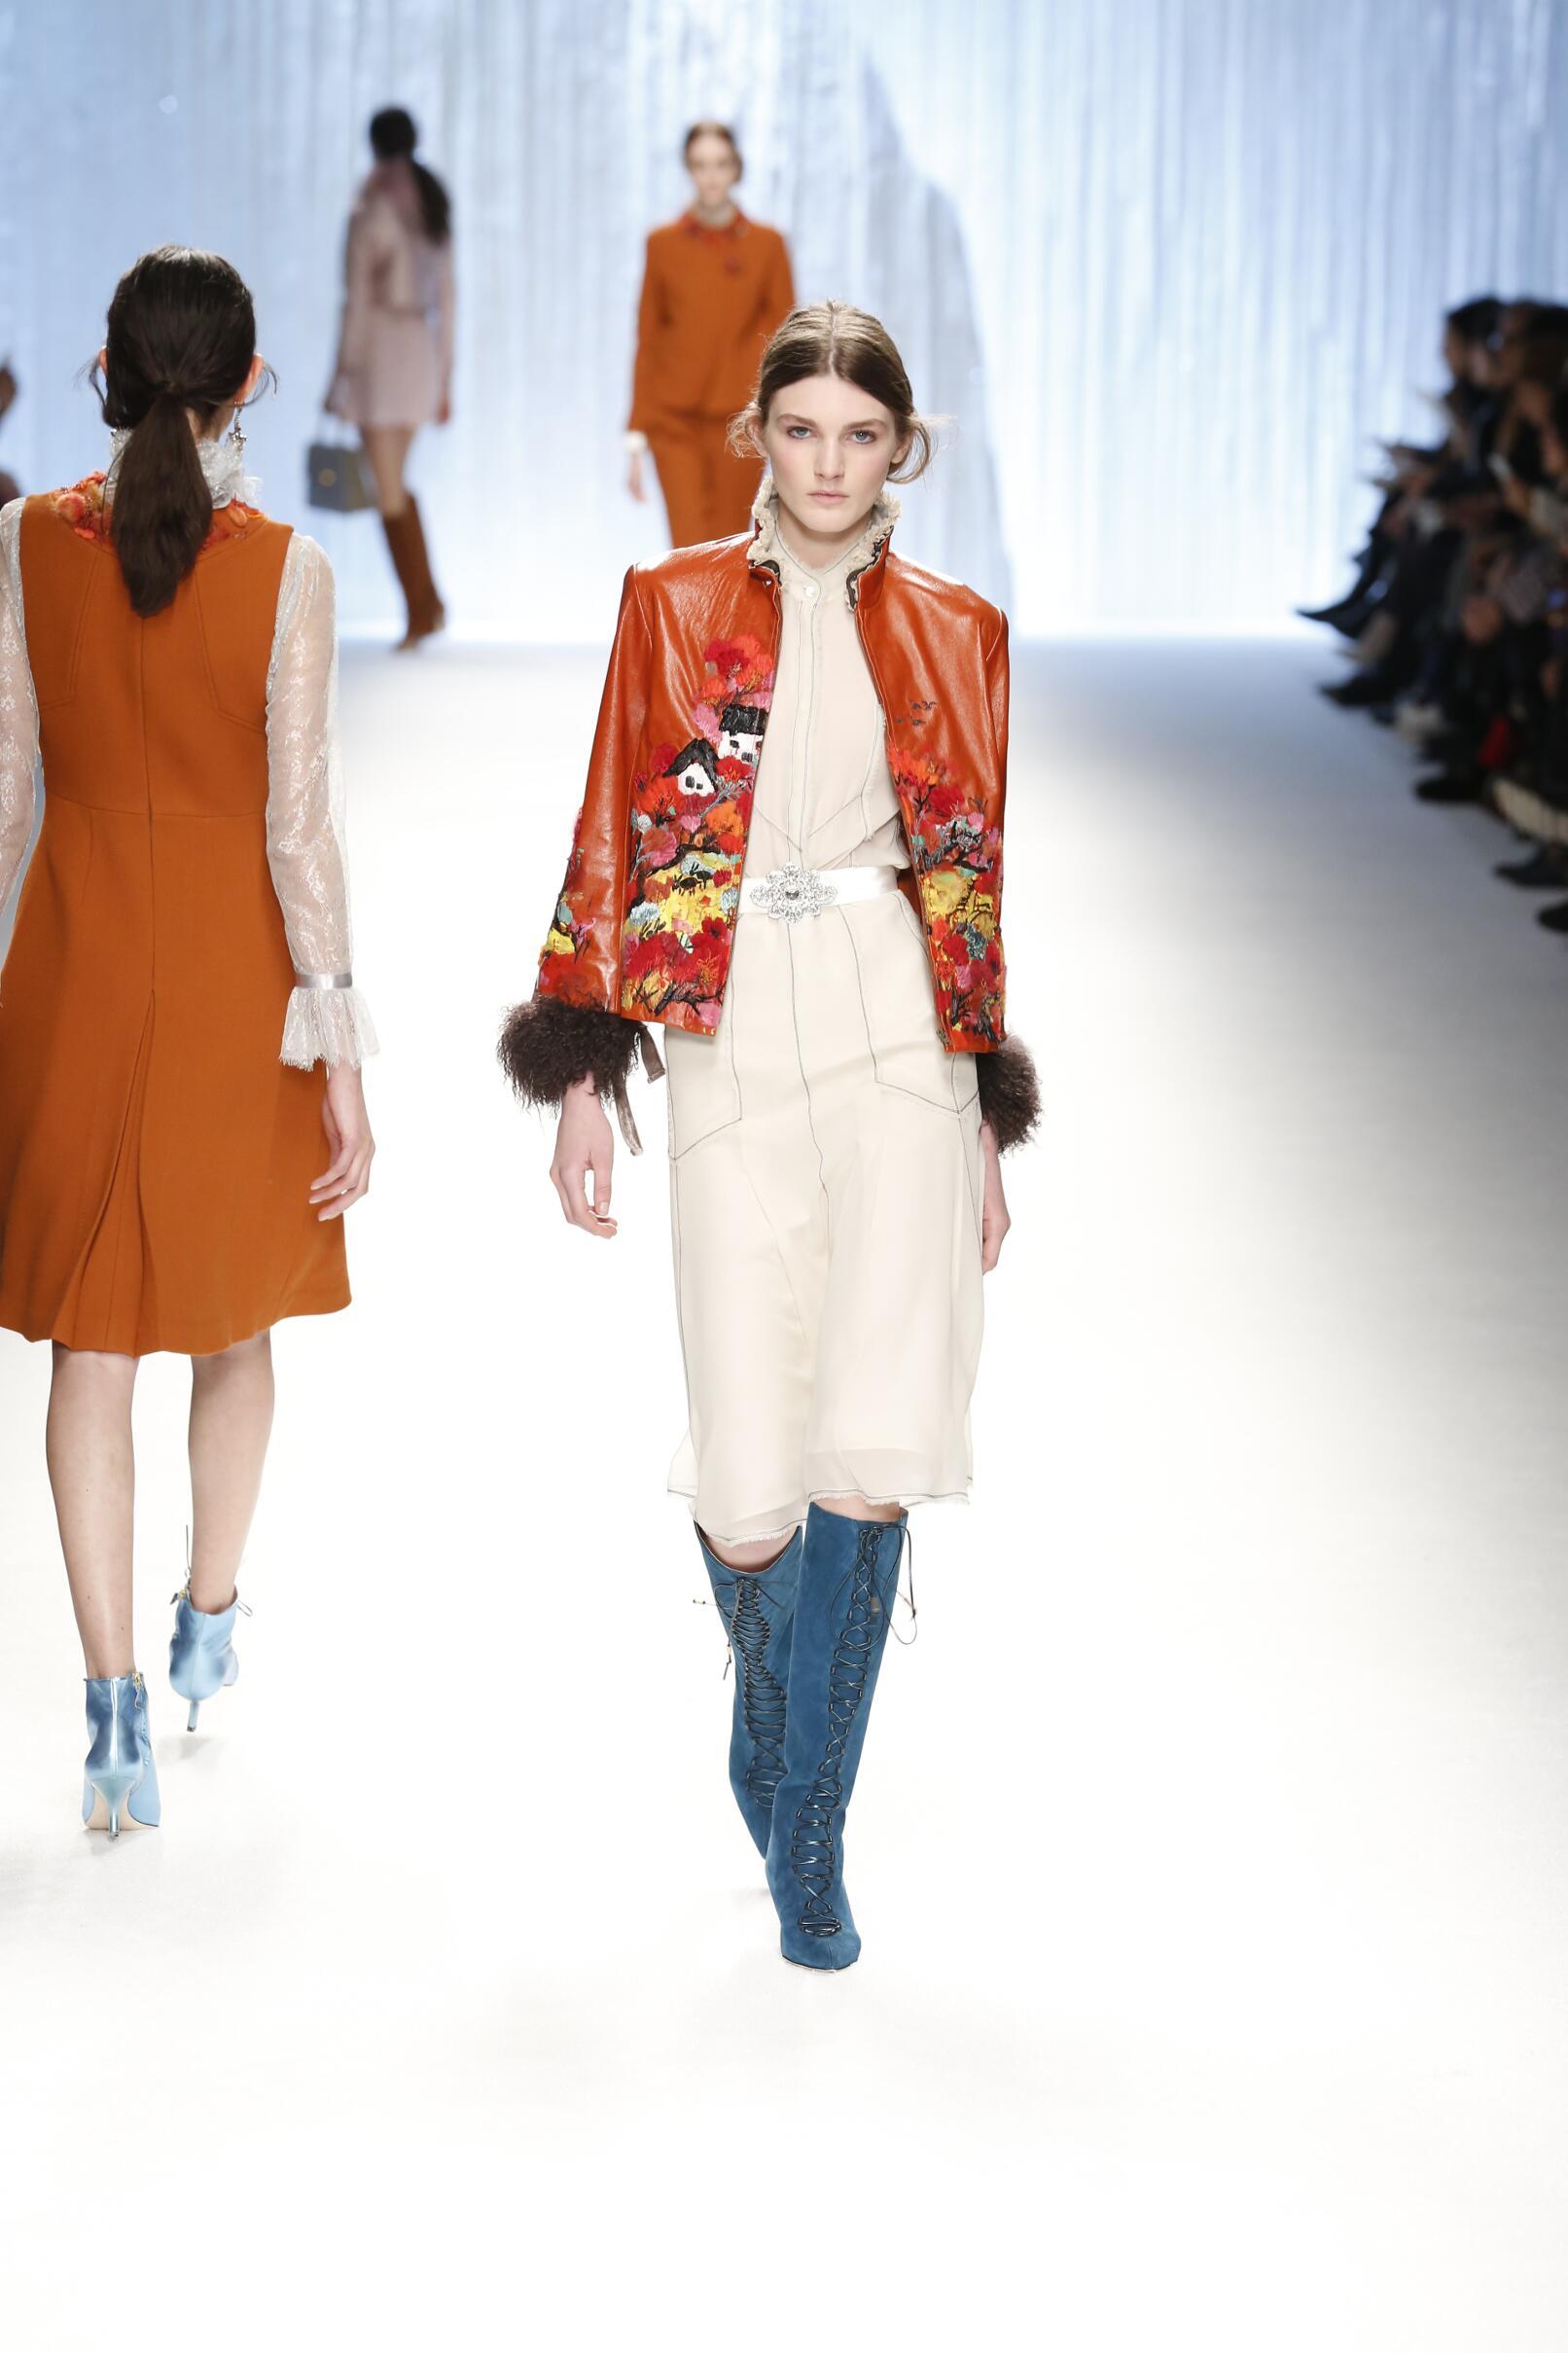 2015 Fashion Woman Model Shiatzy Chen Collection Catwalk